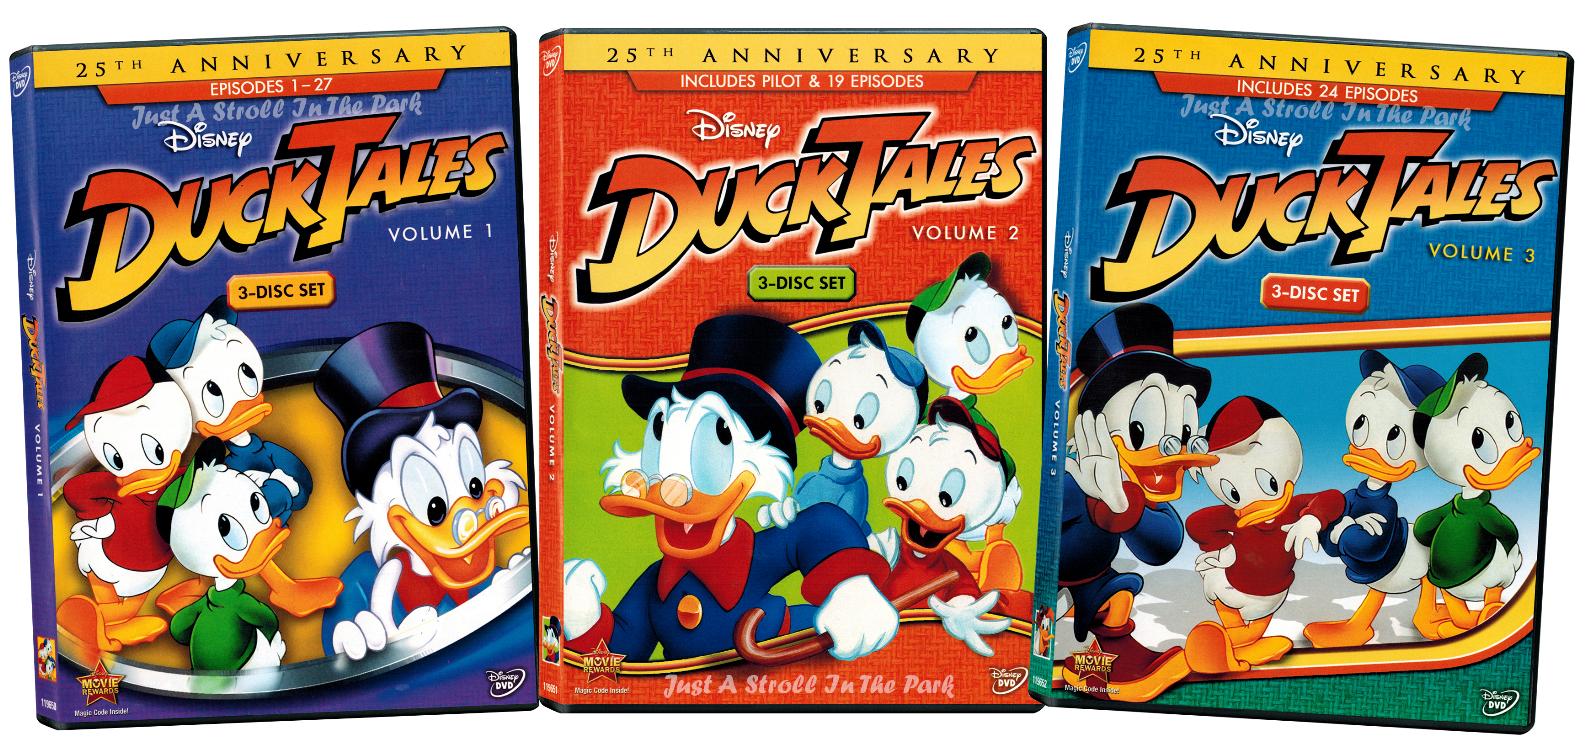 DuckTales: Classic Disney TV Series Complete Volumes 1 2 3 Box / DVD Set(s) NEW!